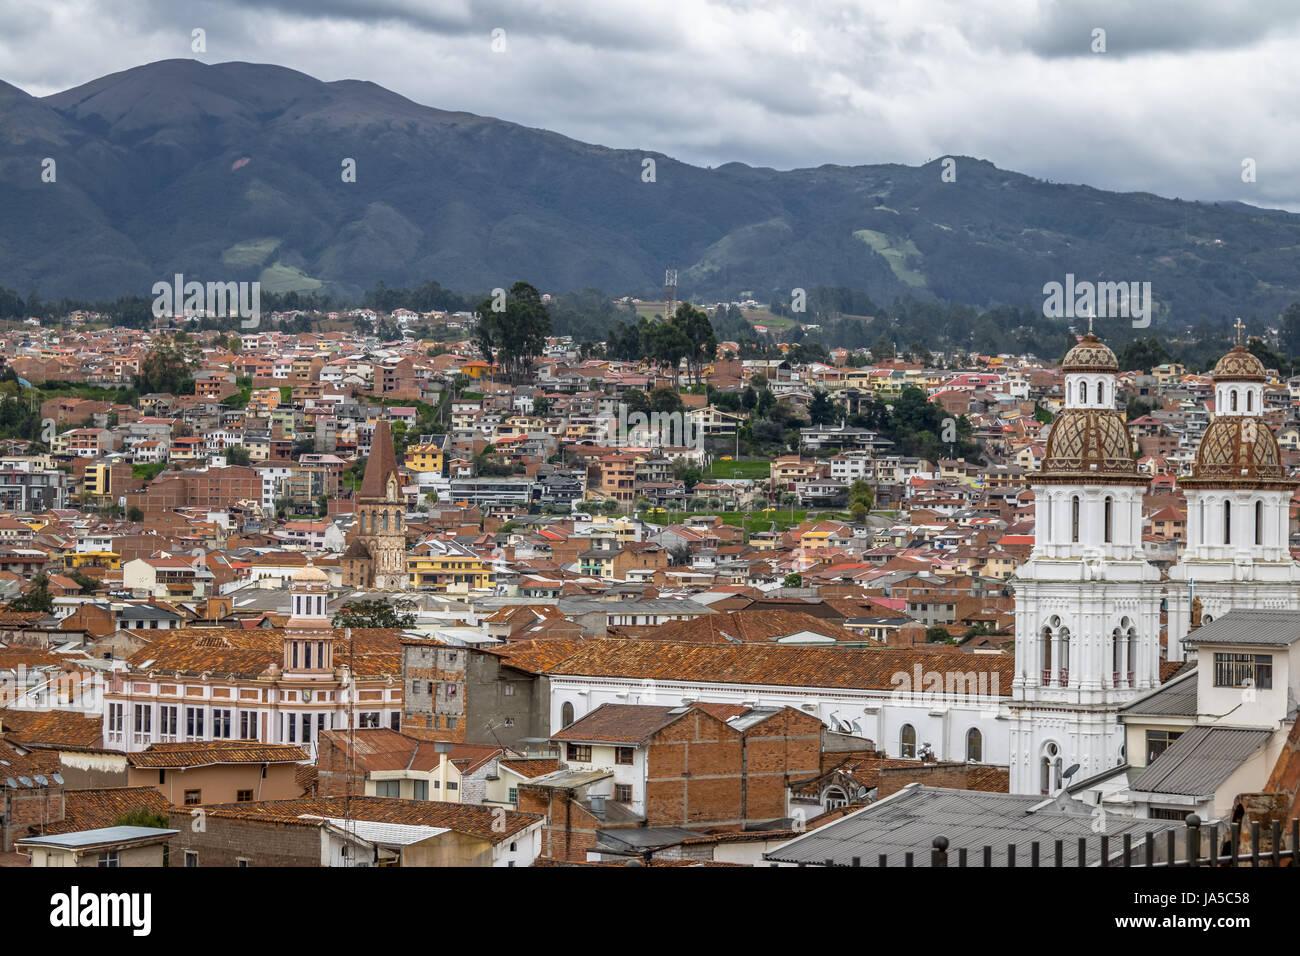 Luftaufnahme der Stadt Cuenca mit Kirche Santo Domingo - Cuenca, Ecuador Stockbild